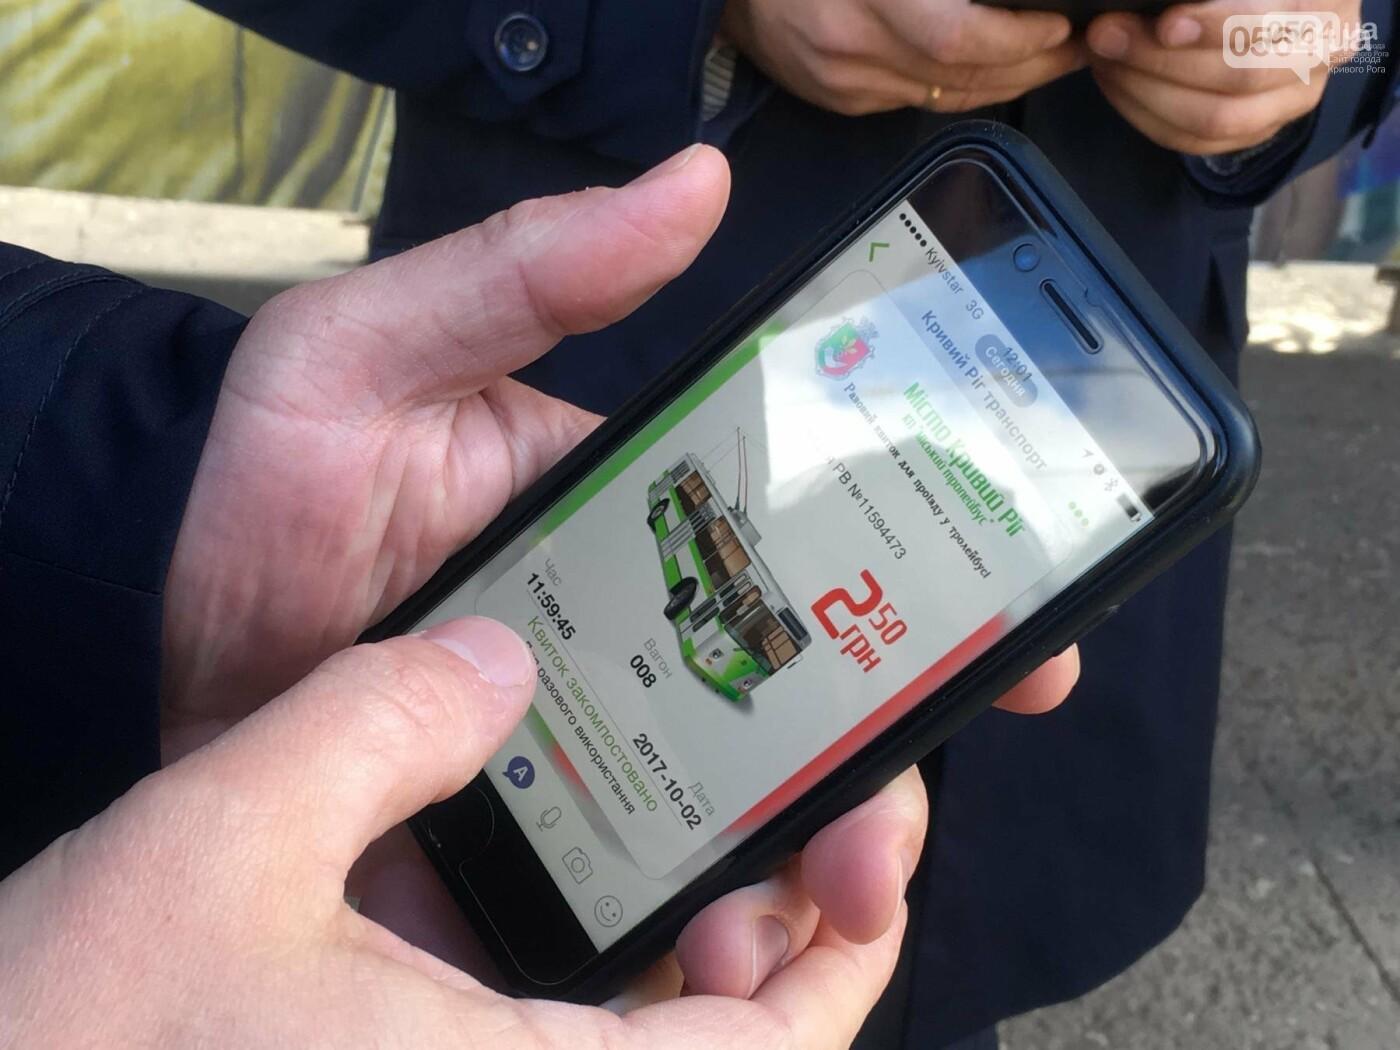 В Кривом Роге: обокрали больницу, стреляли в кафе, тестировали оплату в троллейбусе через смартфон, фото-3